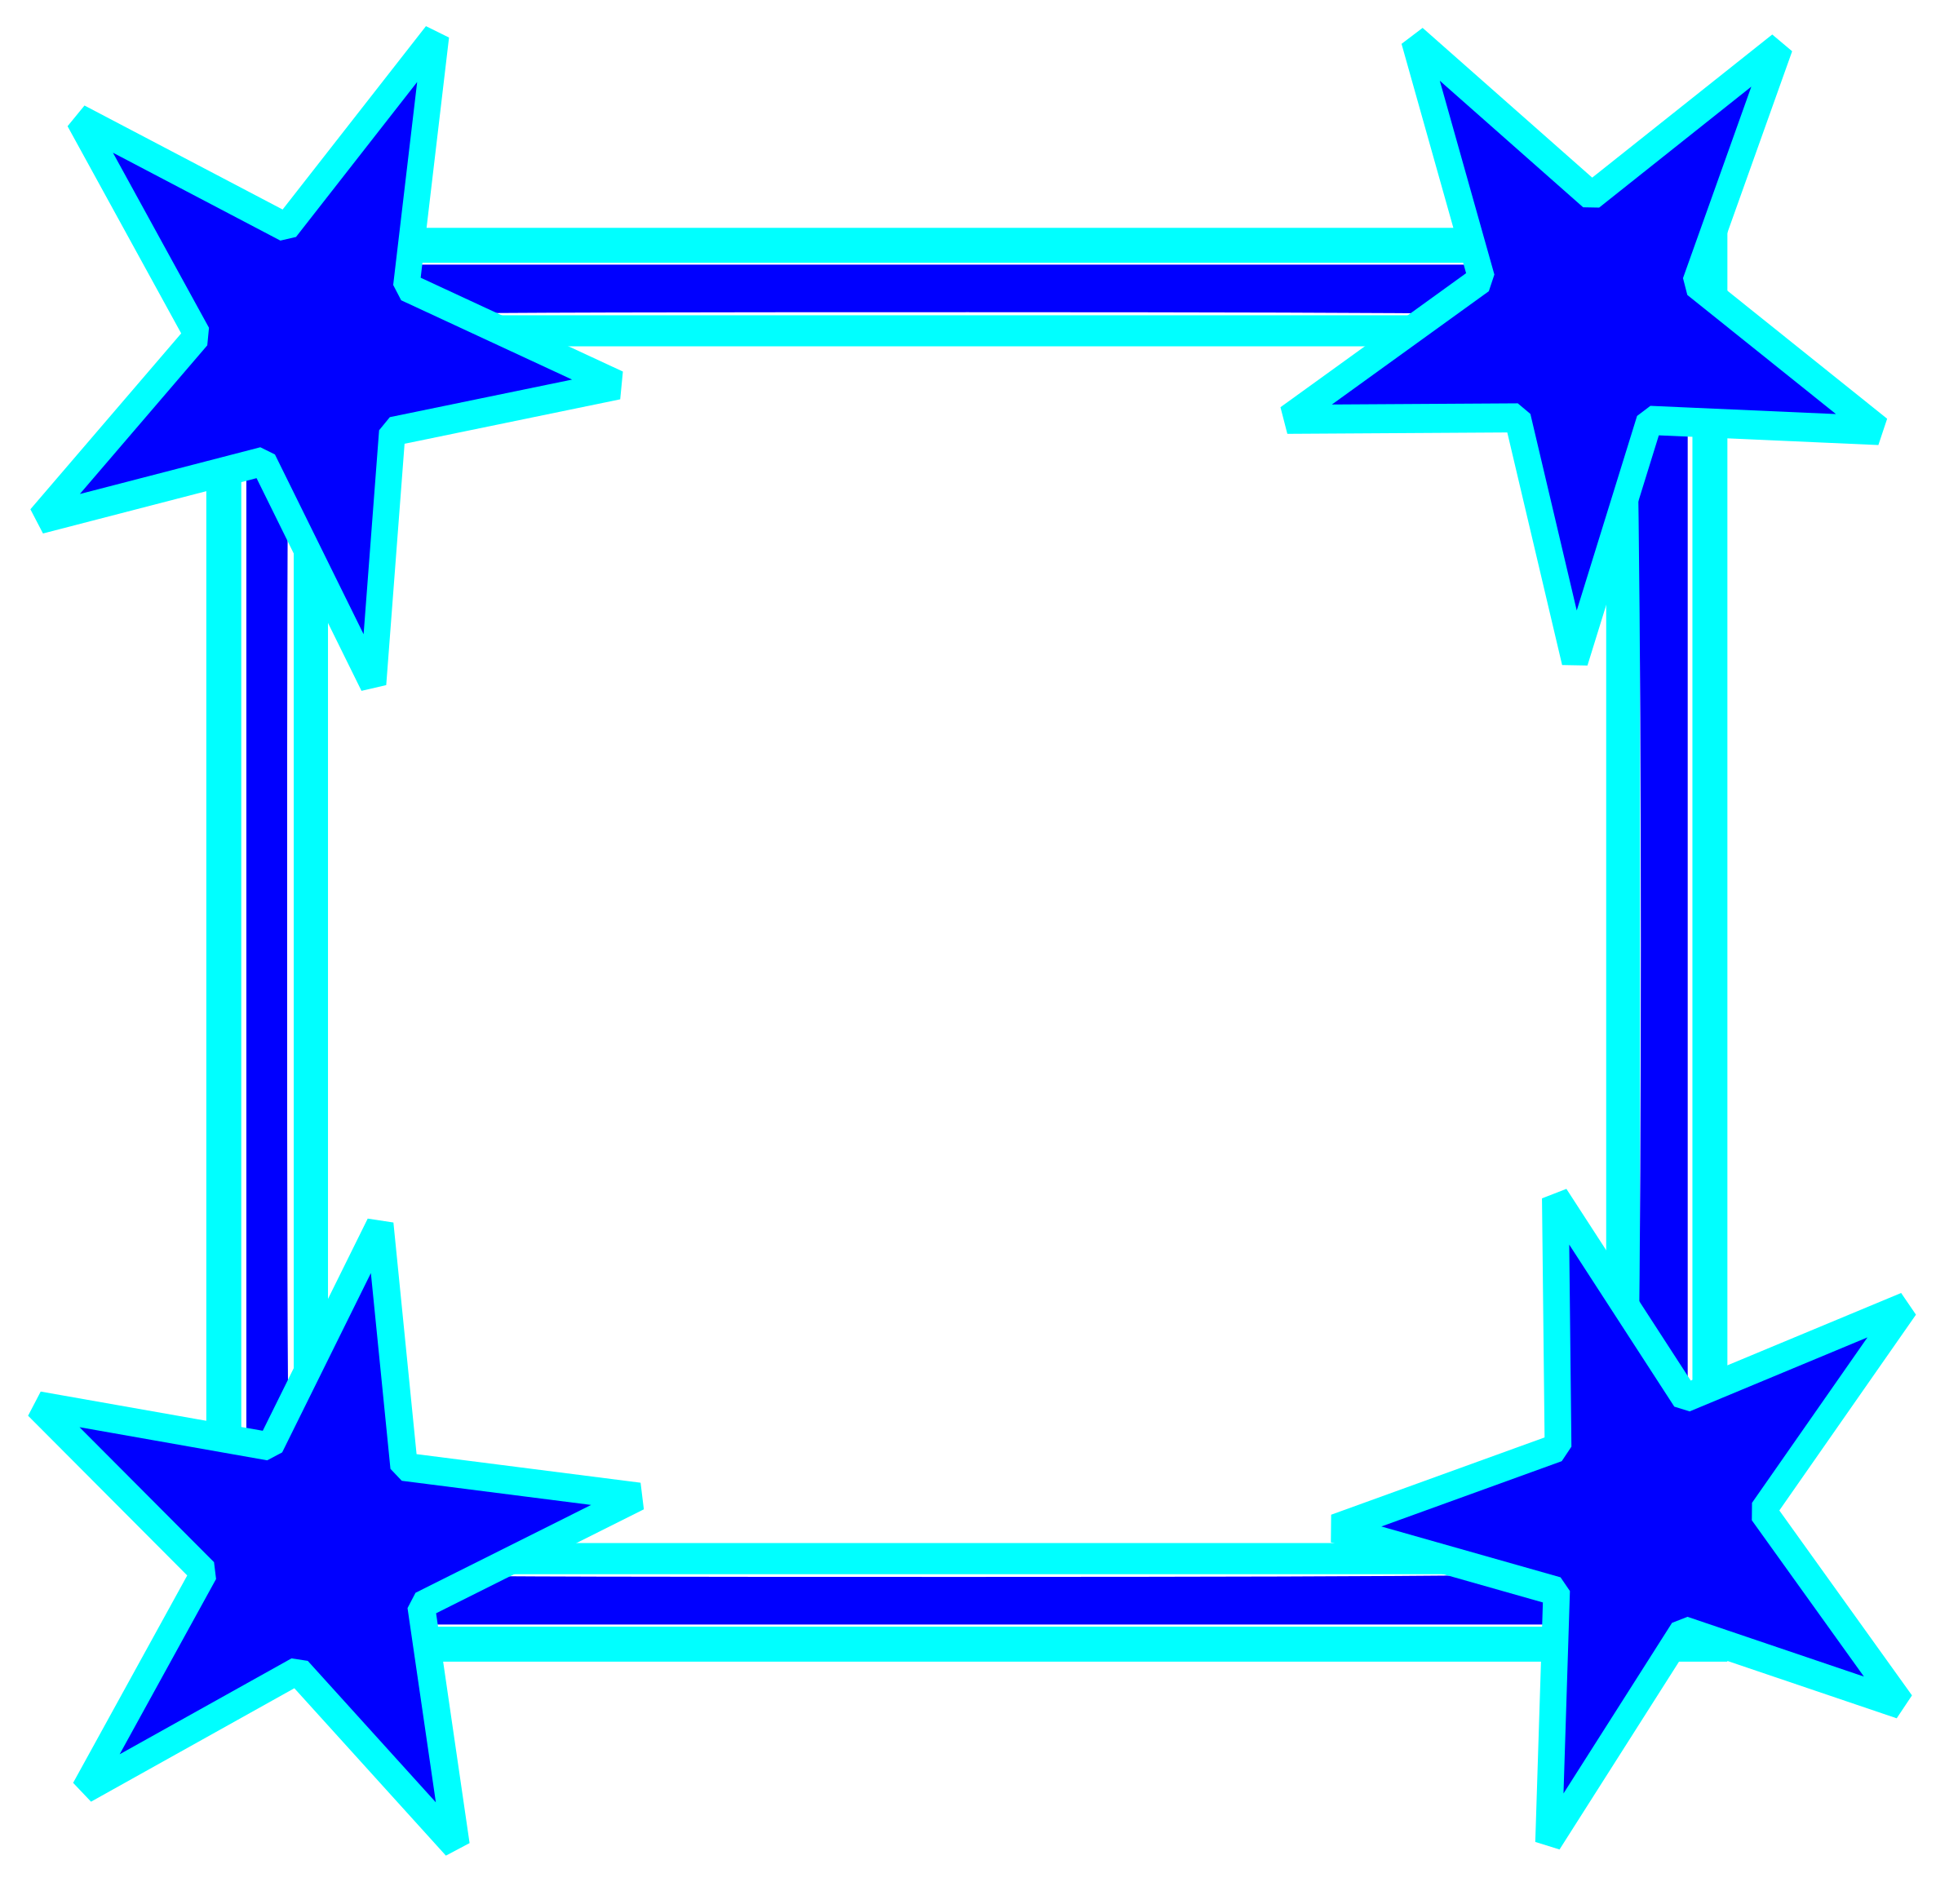 Clipart bright blue star. Border clip art simple